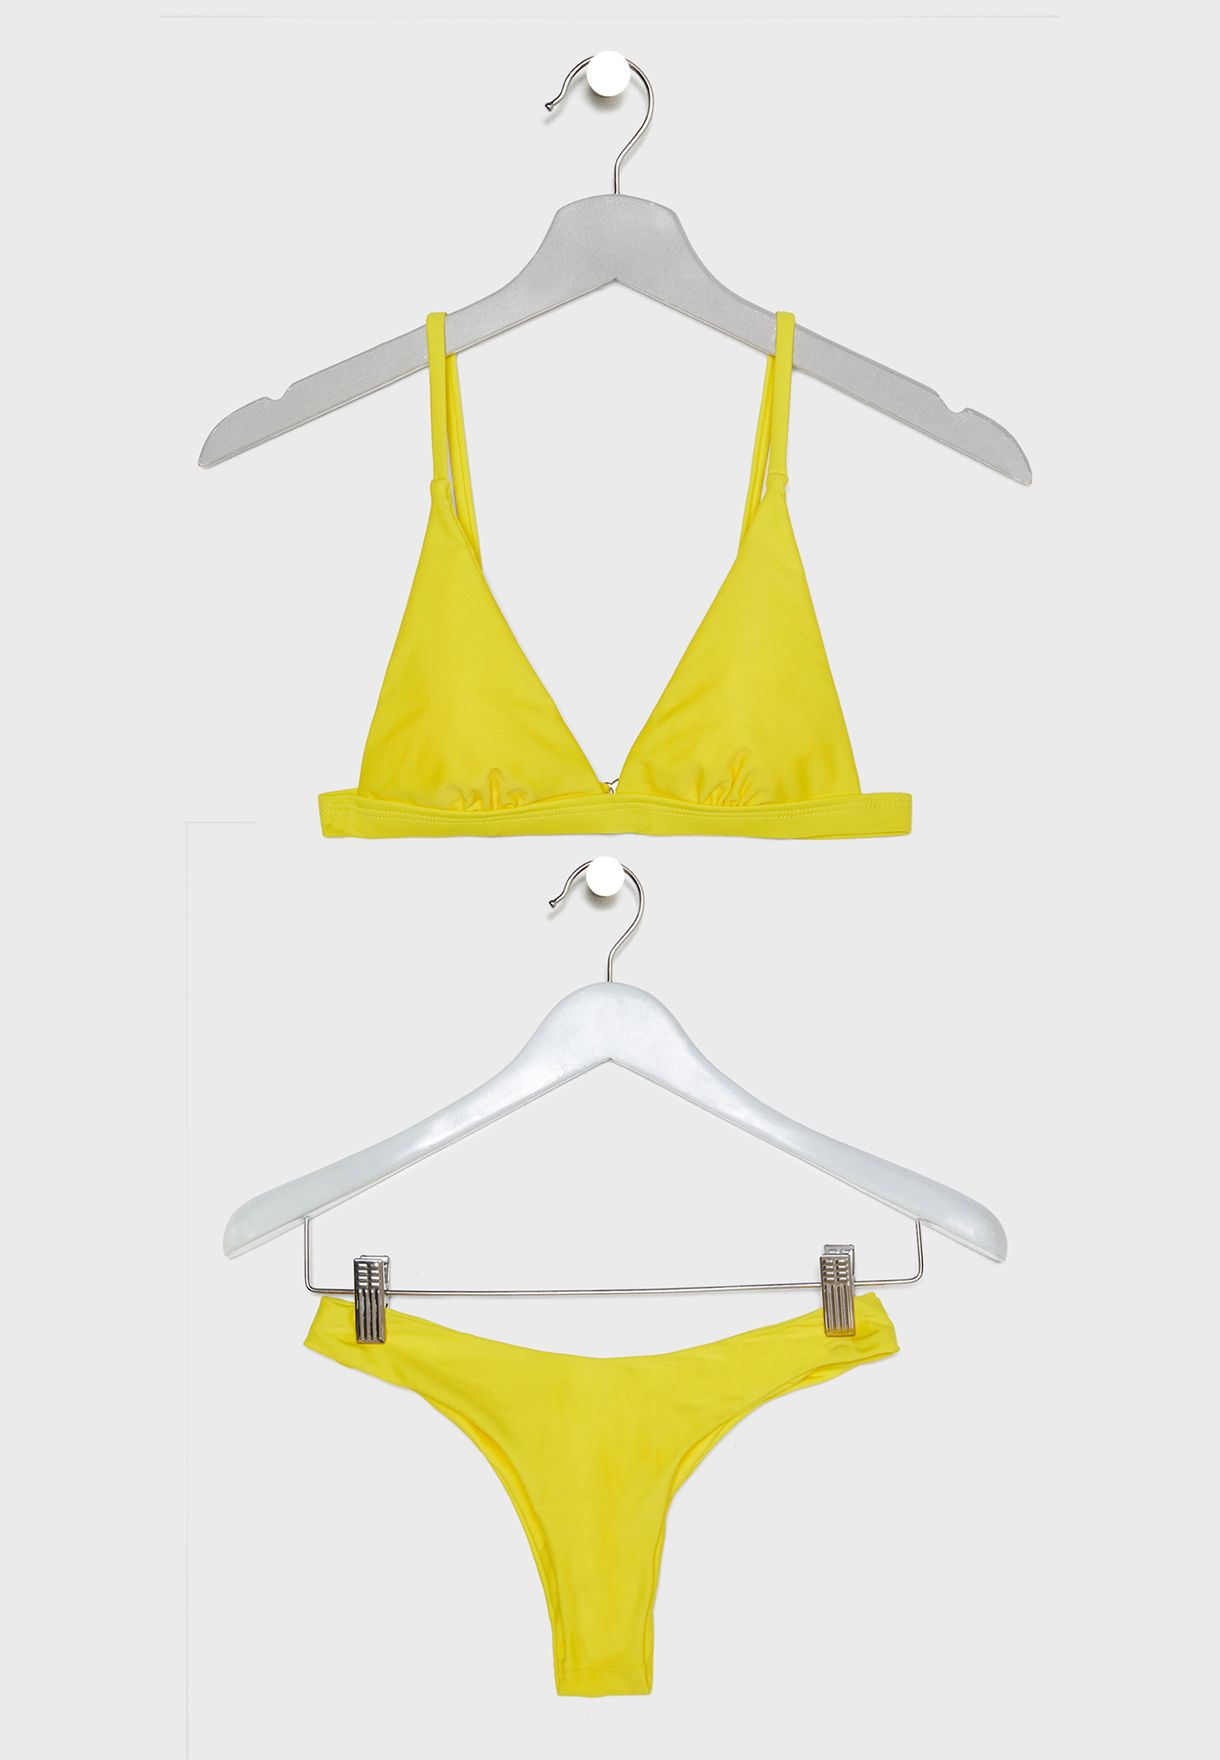 ea97fedb5943d Shop Coconut Cove yellow Triangle High Leg Bikini Set CO255 for Women in  Bahrain - 17768AT46OGP